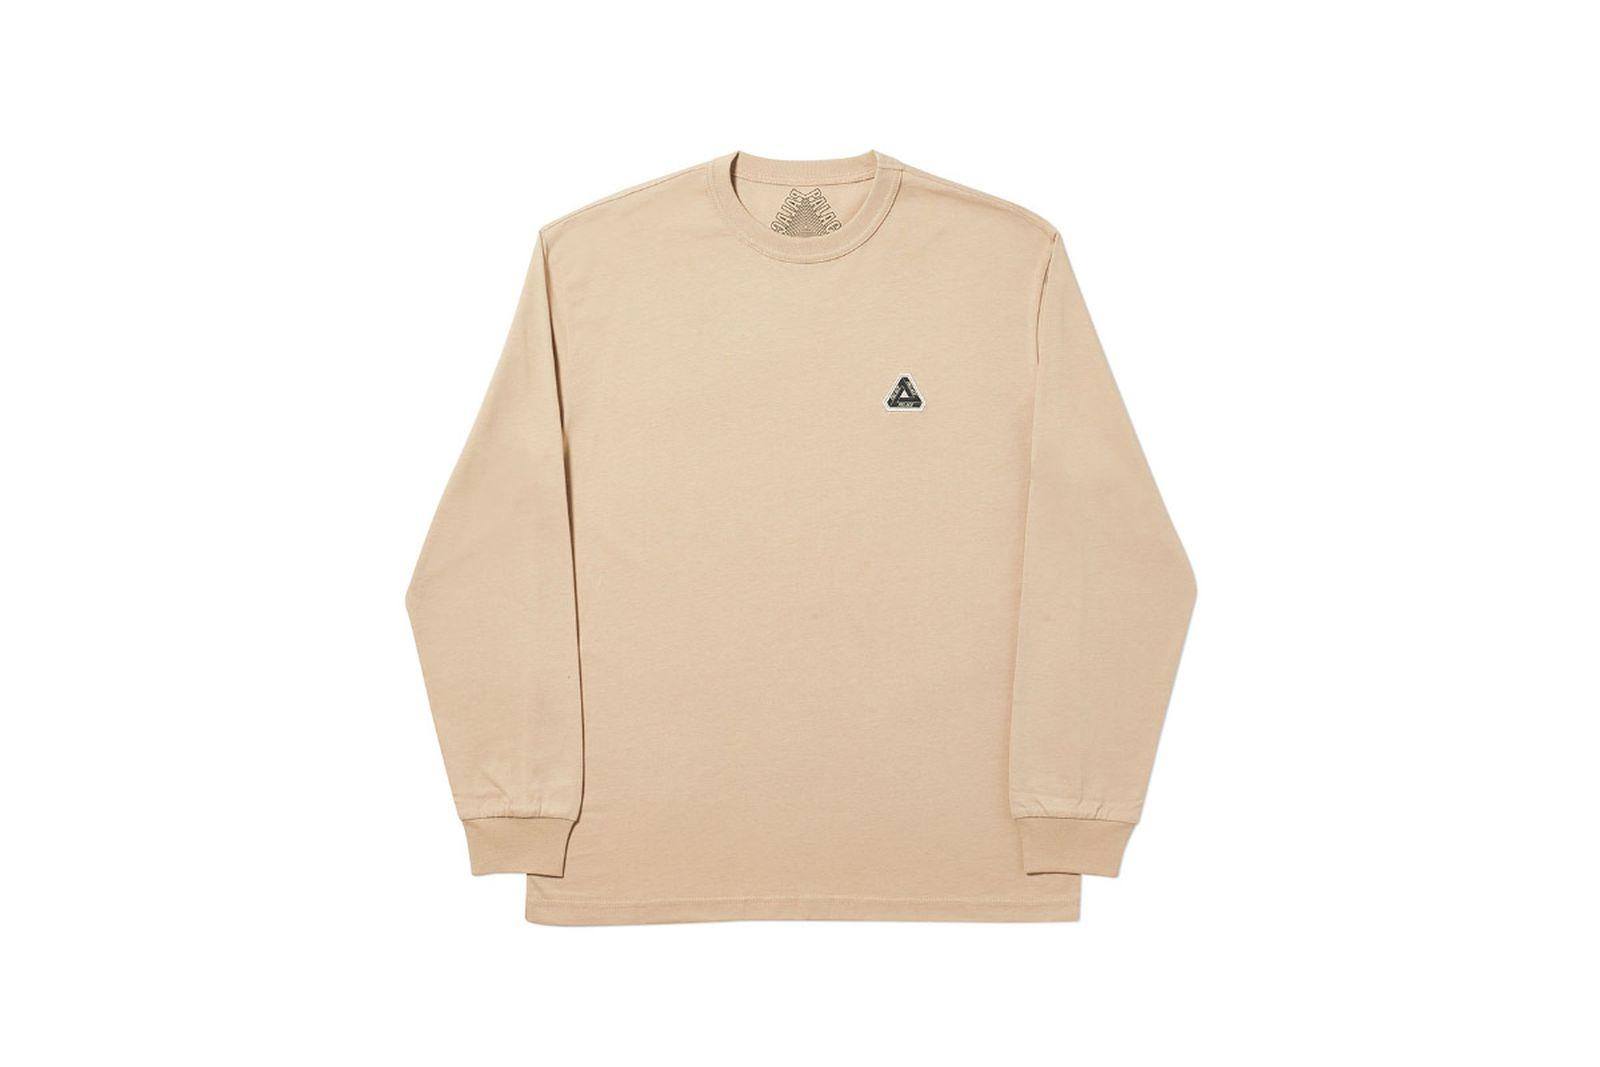 Palace 2019 Autumn Longsleeve T Shirt sesame